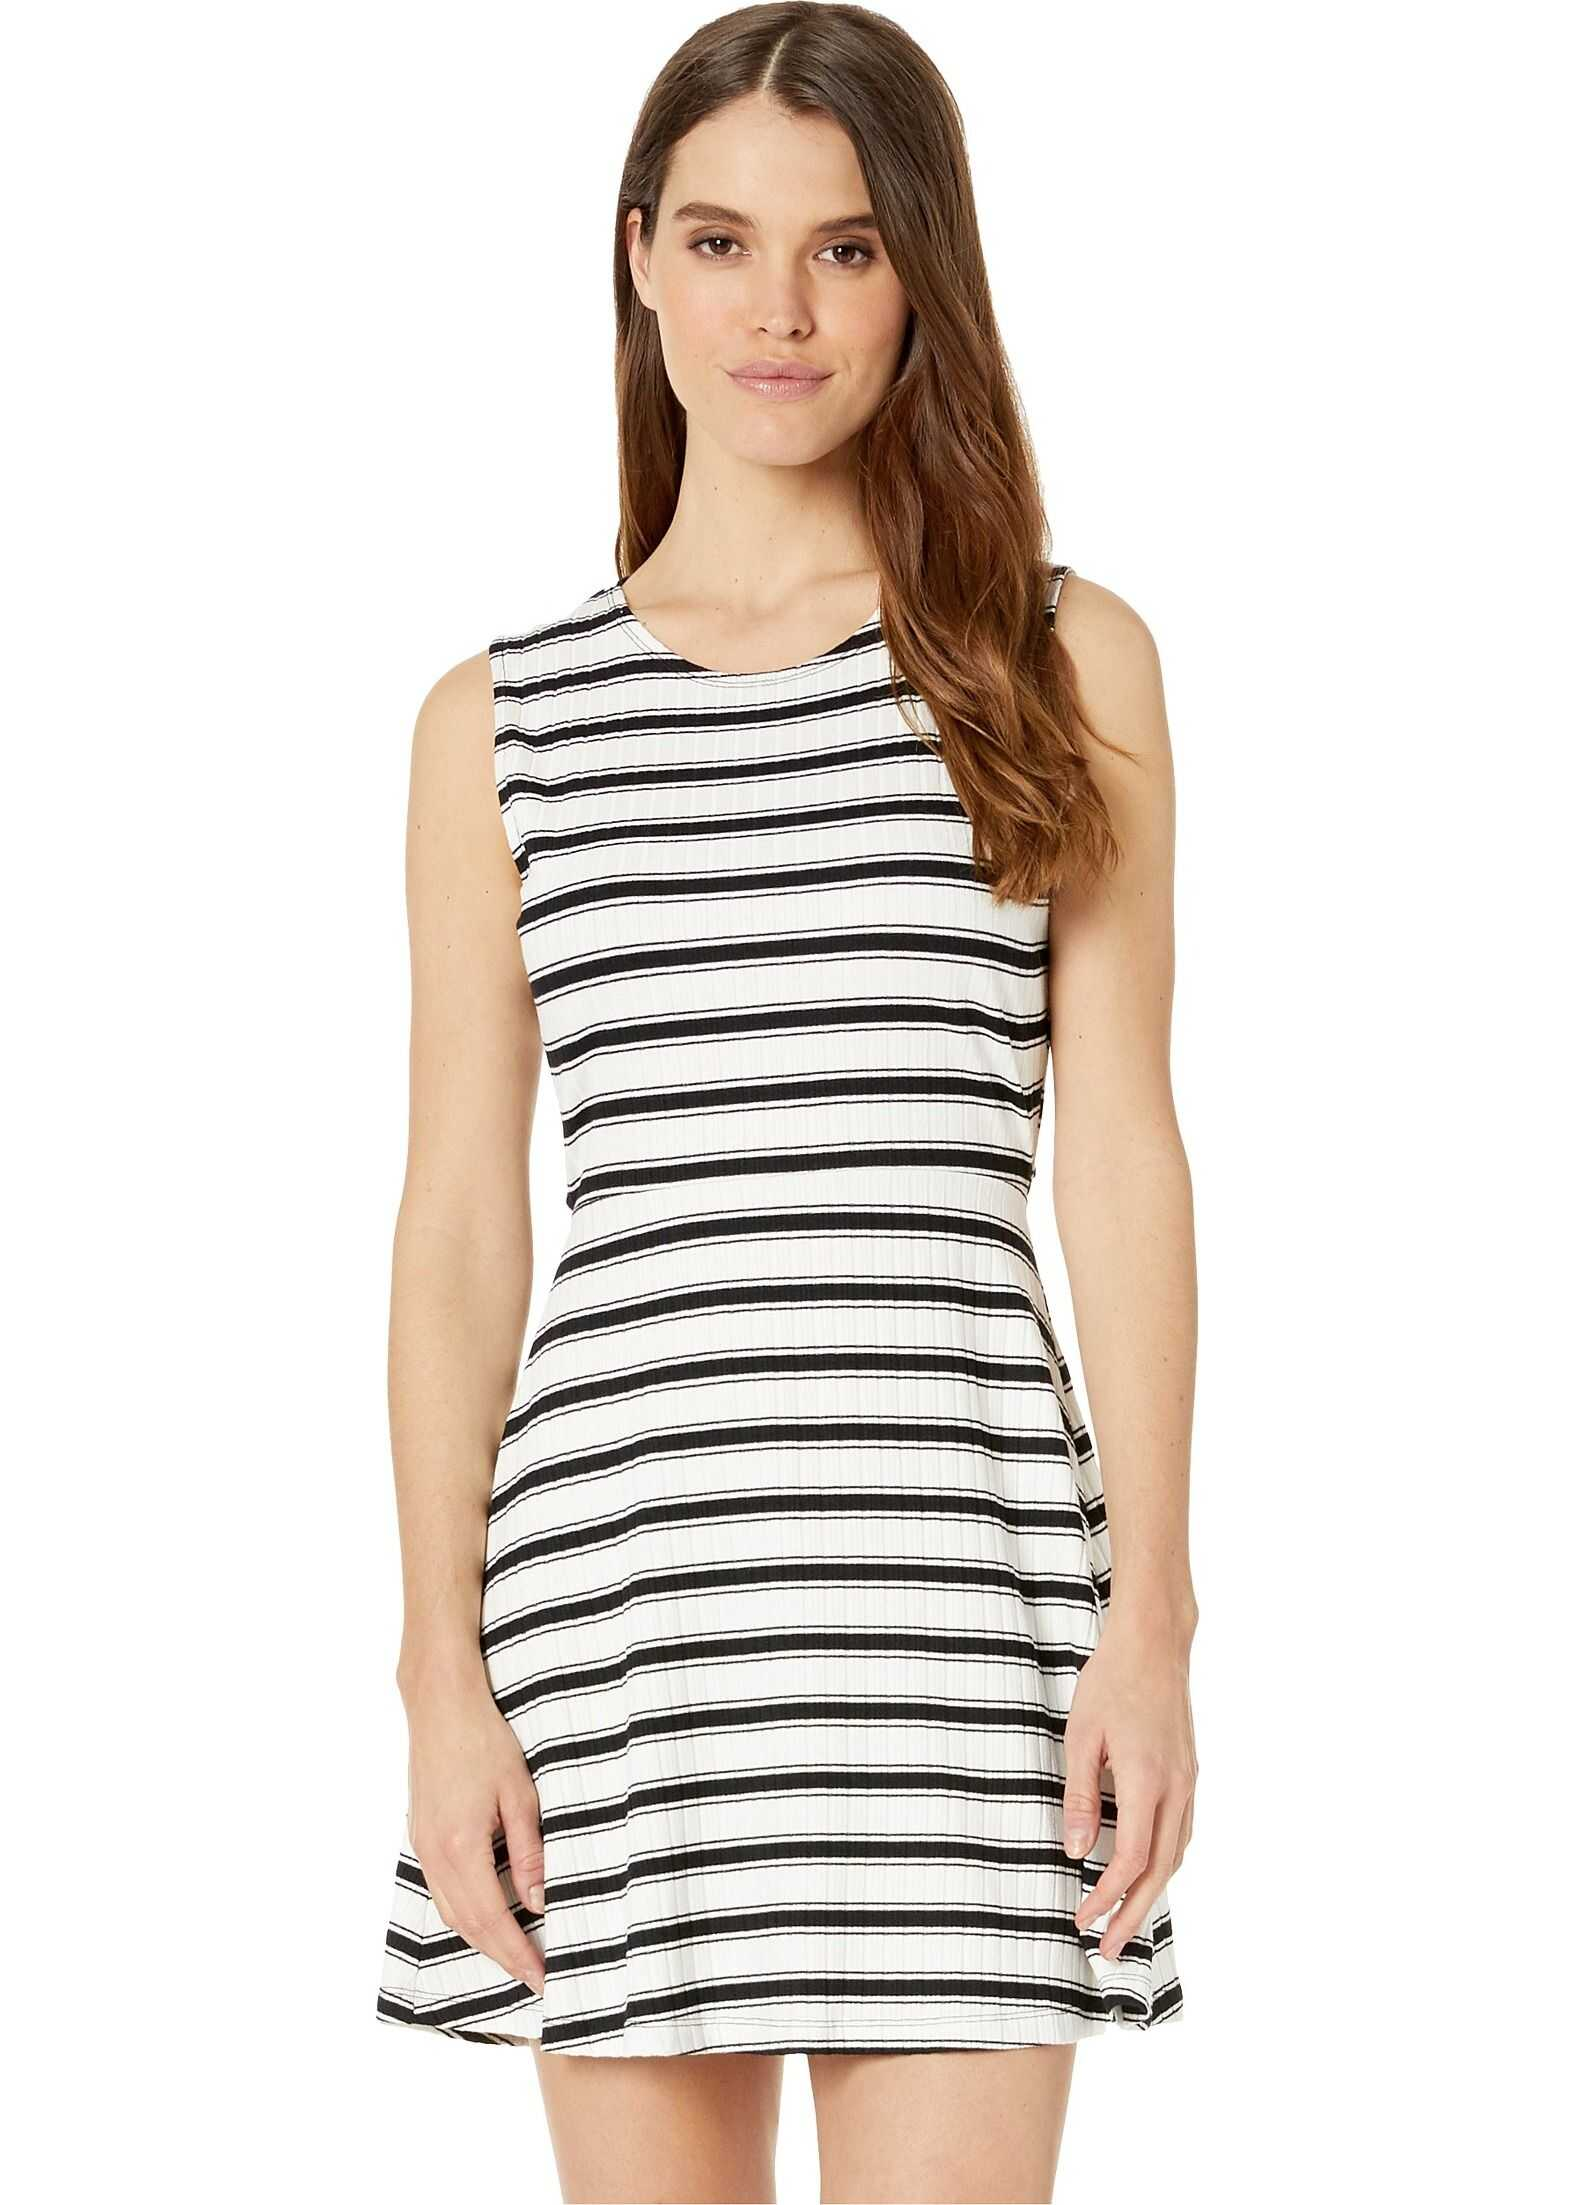 Volcom Stone Stripe Dress Black/White